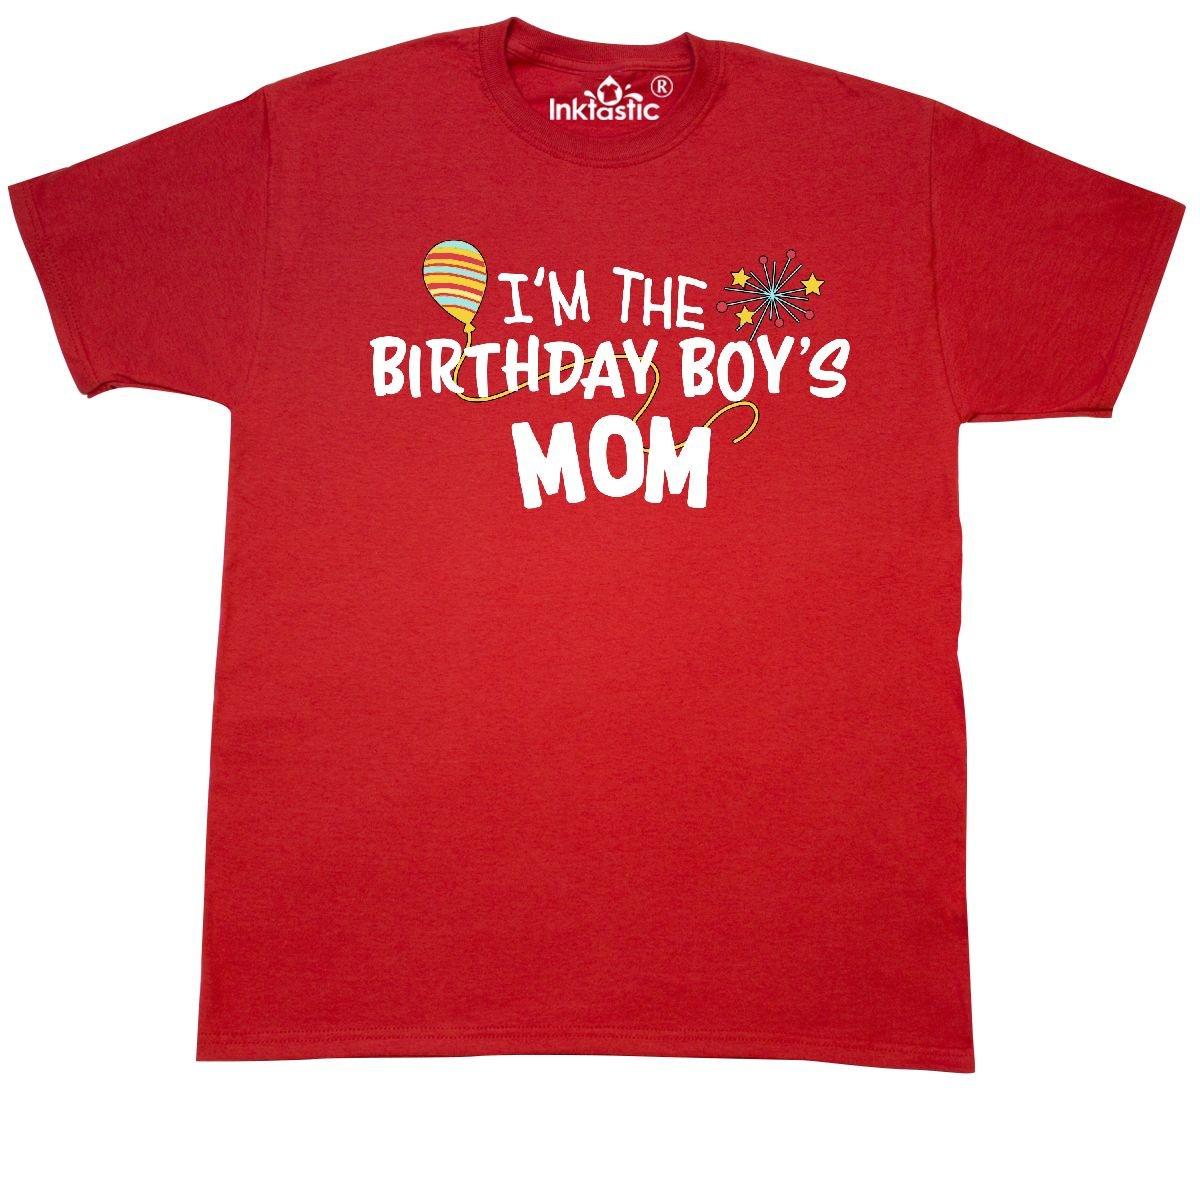 06298e2d Amazon.com: Inktastic - I'm the Birthday Boy's Mom T-Shirt: Clothing